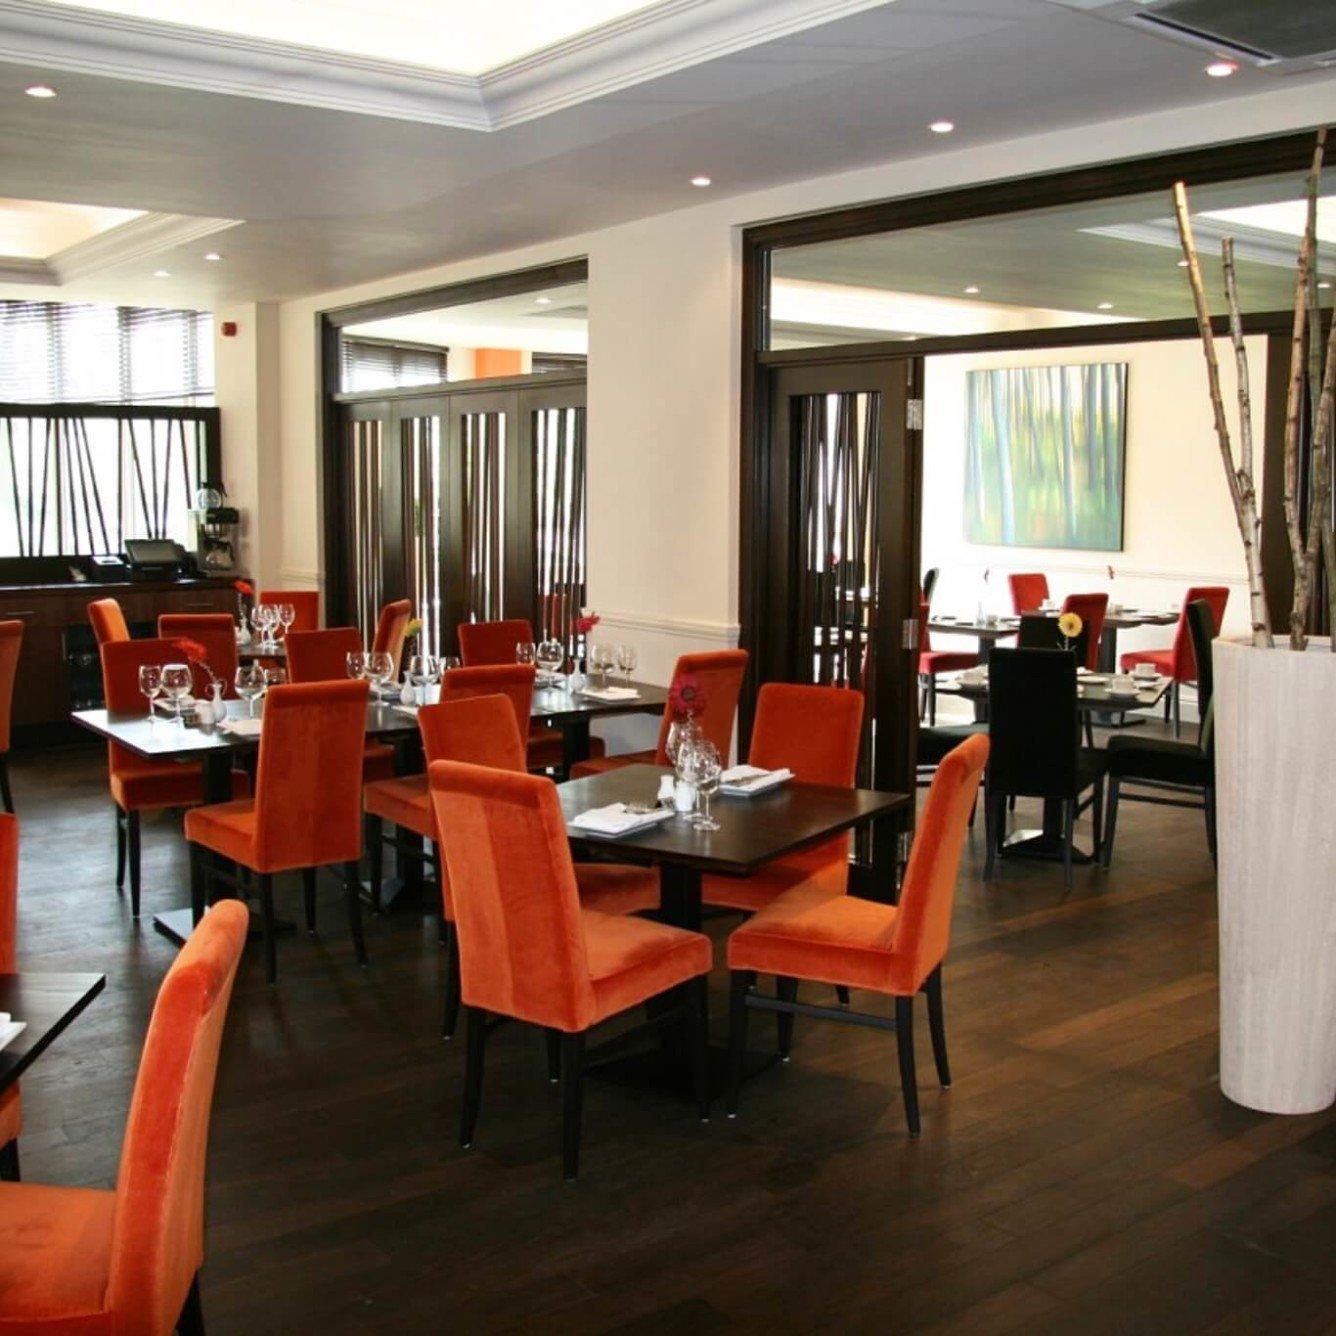 Chelteham Lakeside restaurant refurbishment - view on main dining area